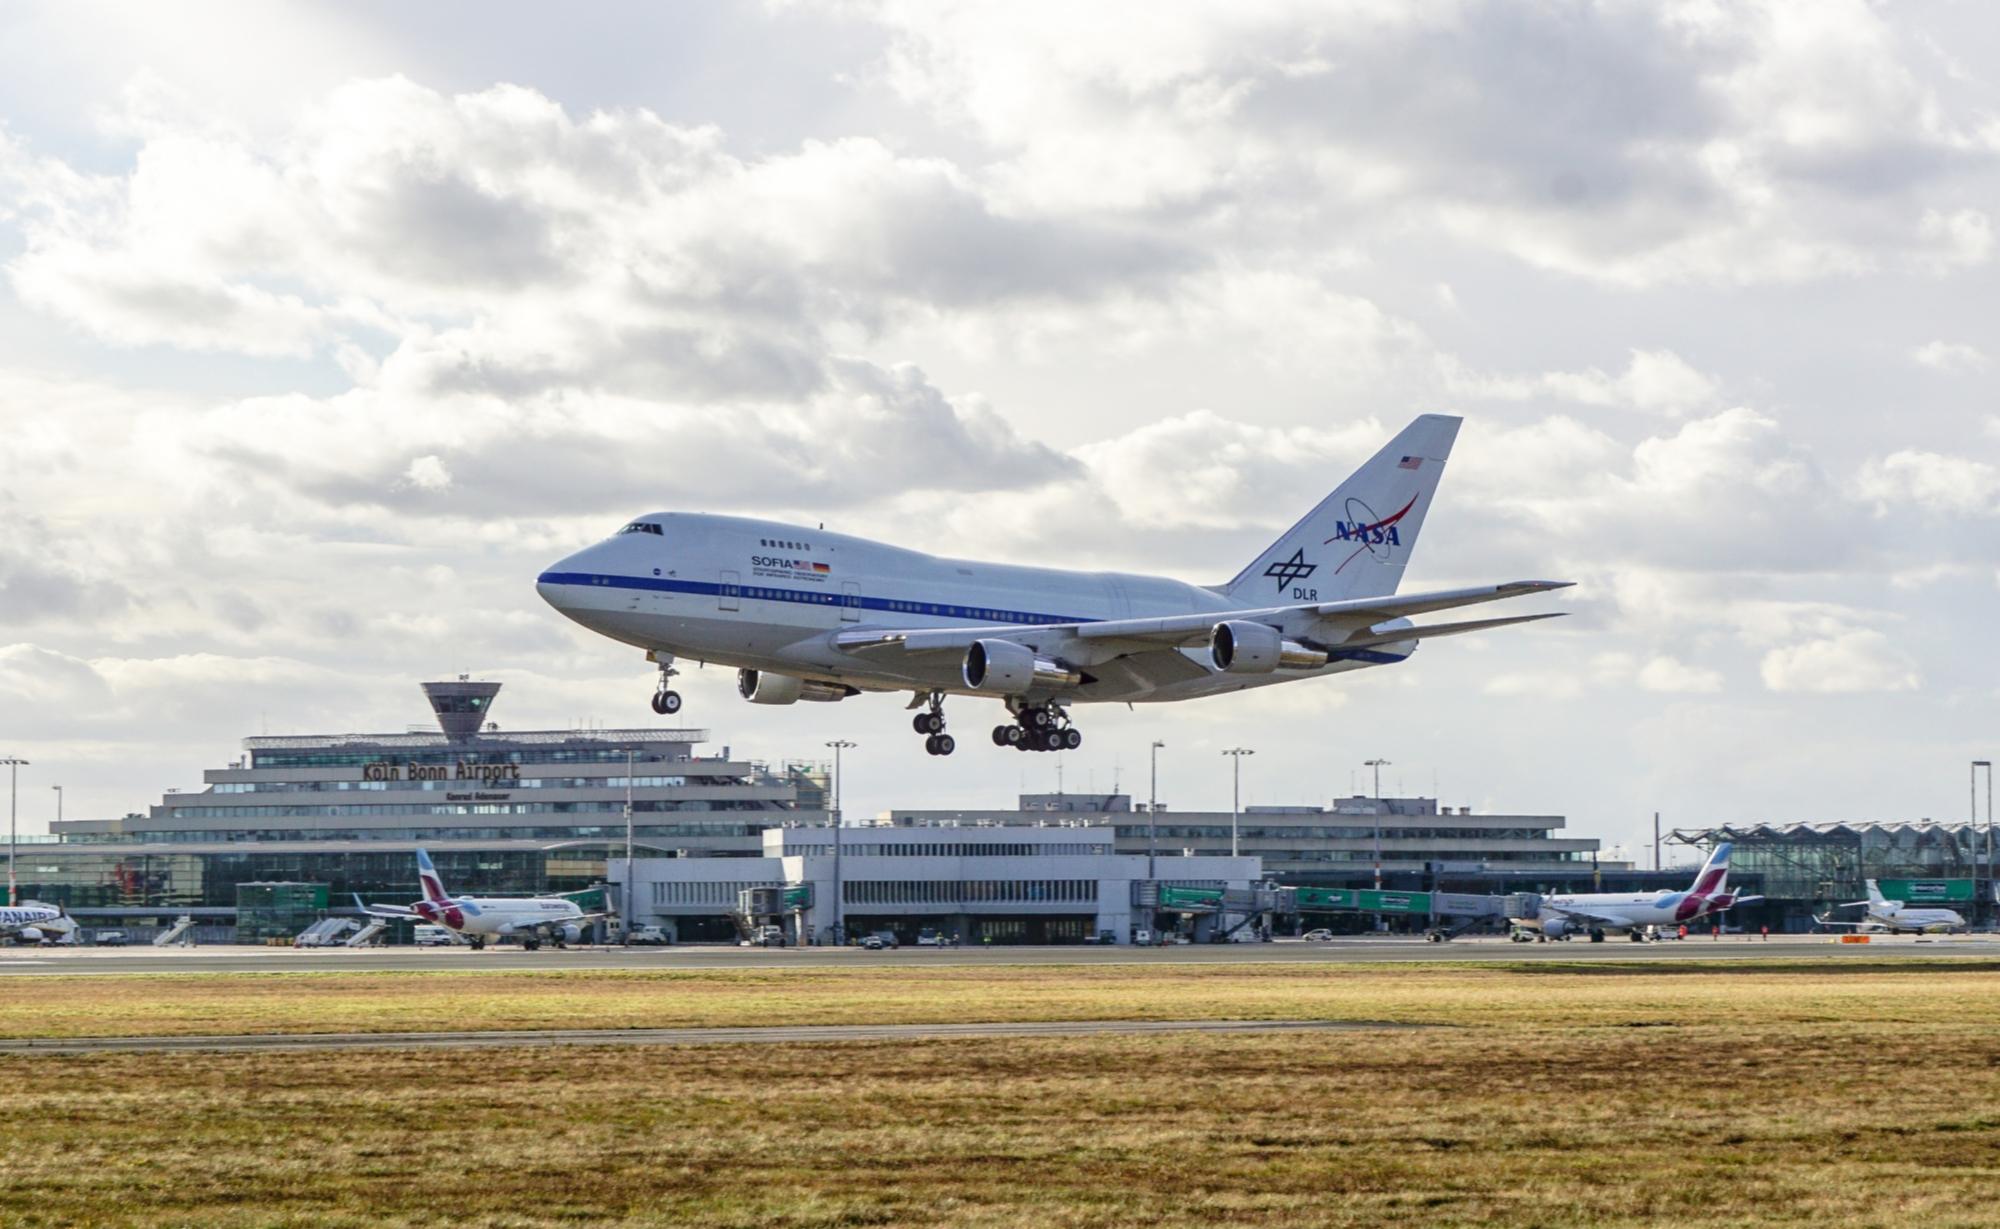 Landung in Köln